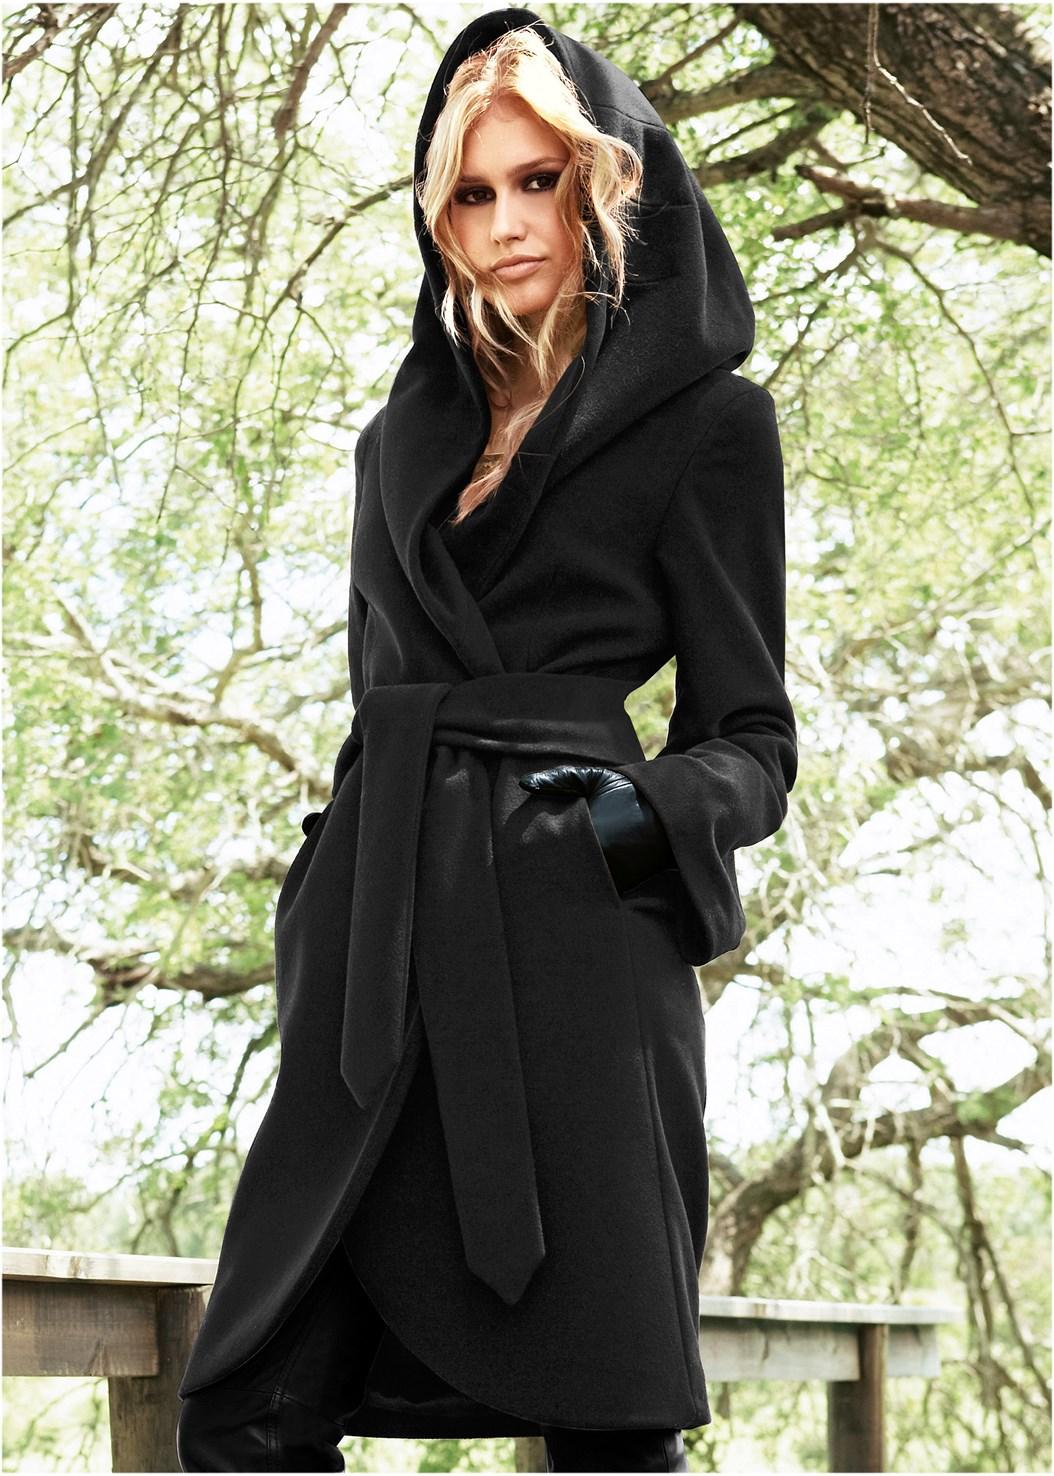 Hooded Wrap Coat,Fold Over Boot,Knot Hoop Earrings,Fringe Scarf,Paillette Detail Scarf,Stud Detail Crossbody